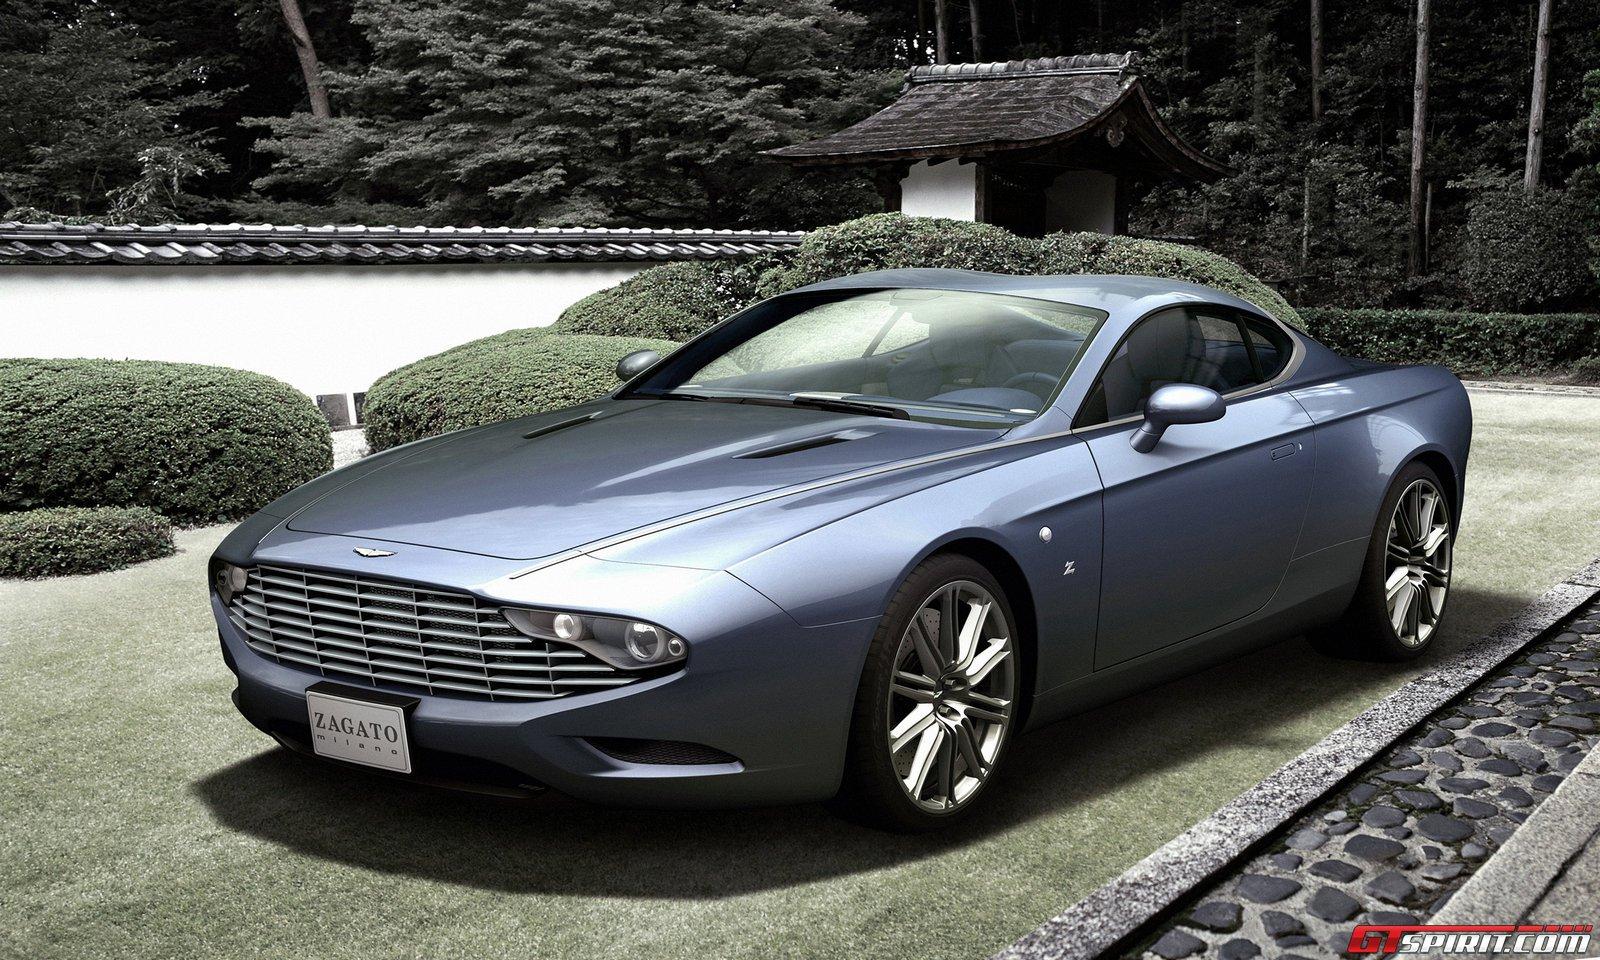 Aston Martin Vanquish New Images Revealed | Auto Design Tech